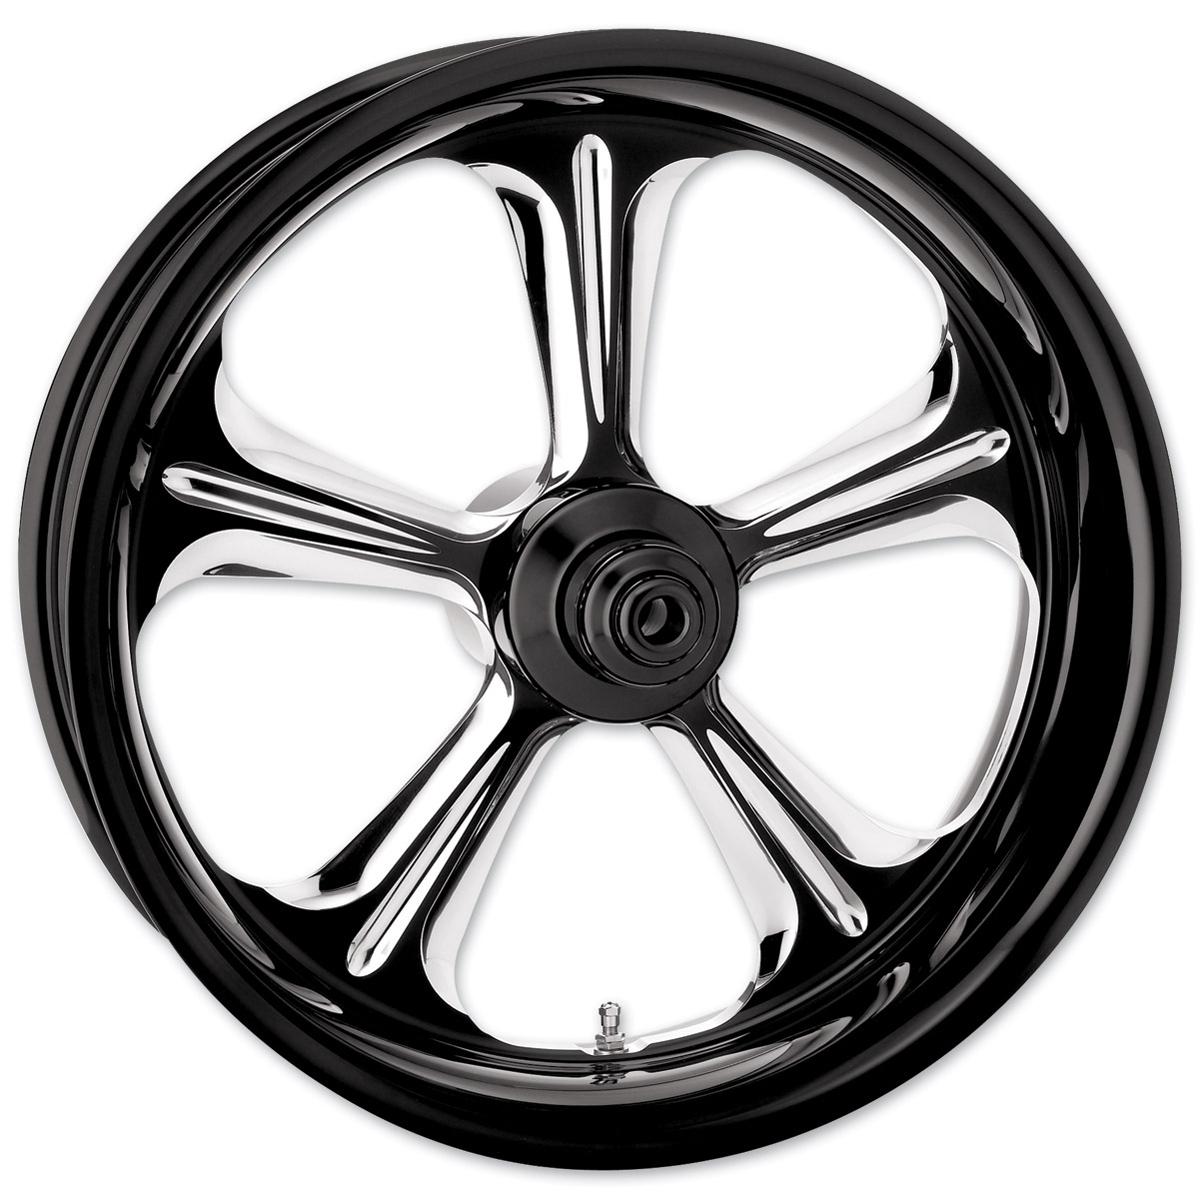 Performance Machine Wrath Platinum Cut Front Wheel 21x3.5 ABS